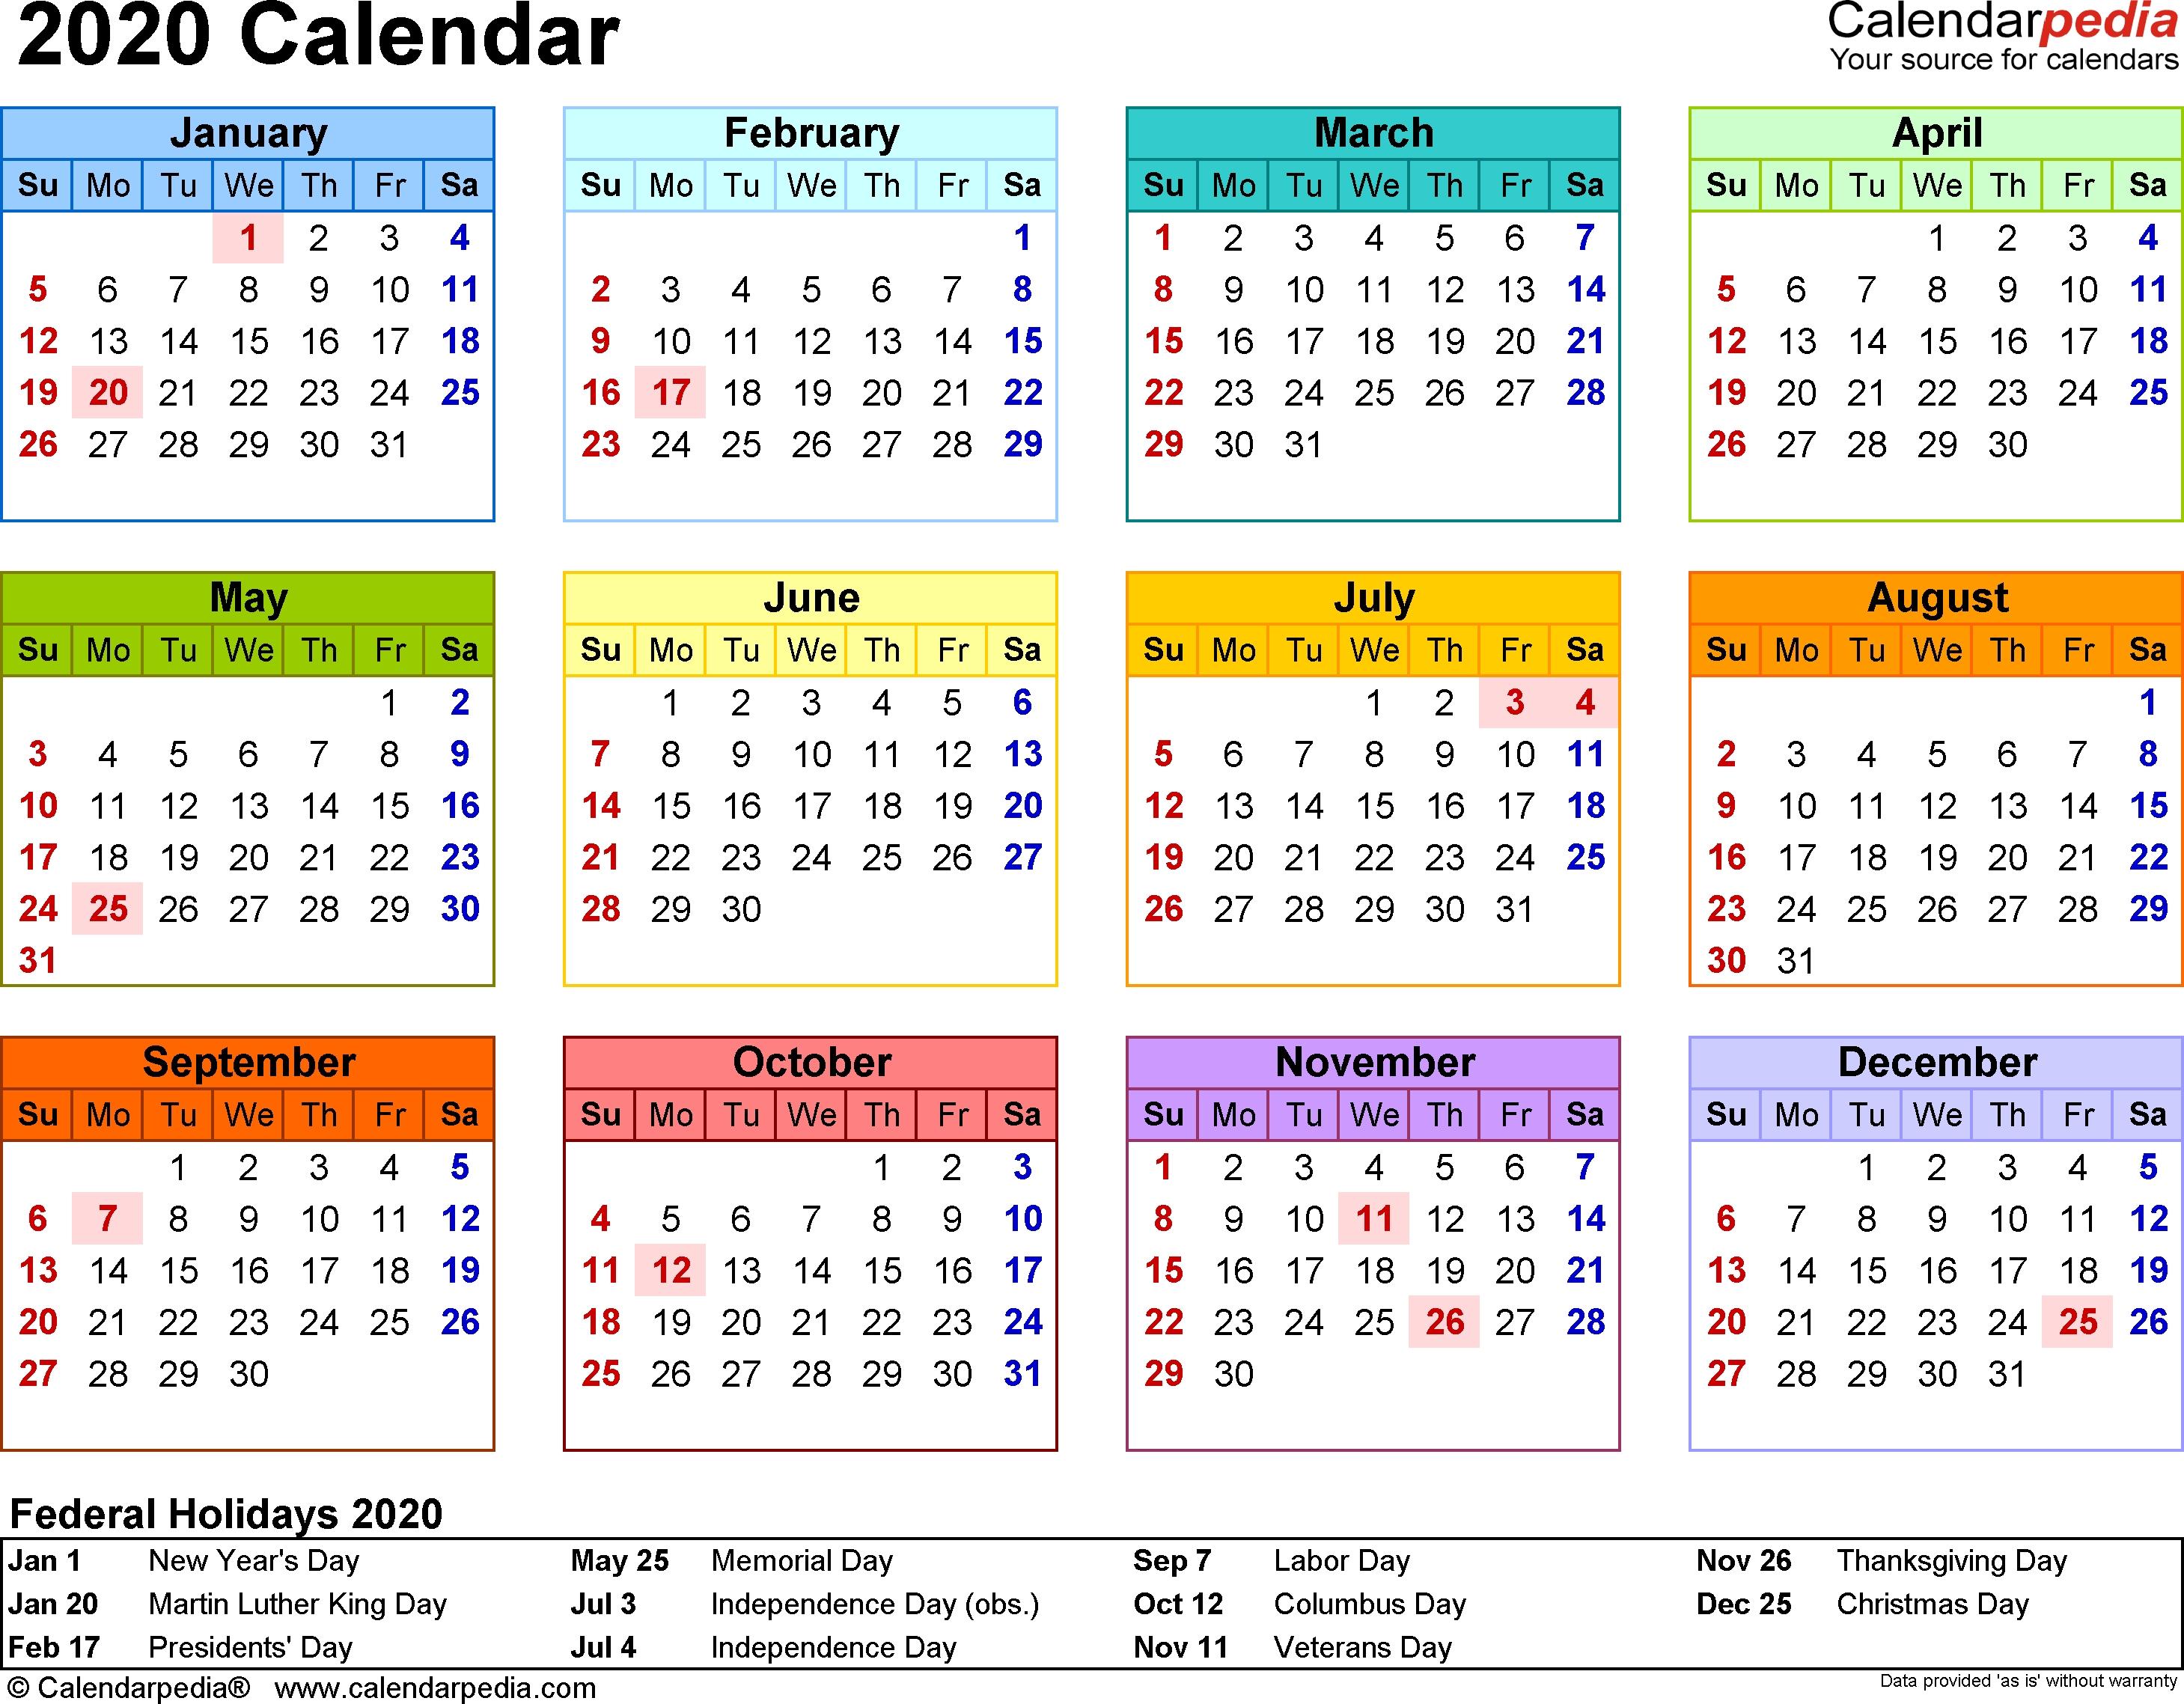 2020 Calendar - Download 18 Free Printable Excel Templates-January 2020 Calendar Hk